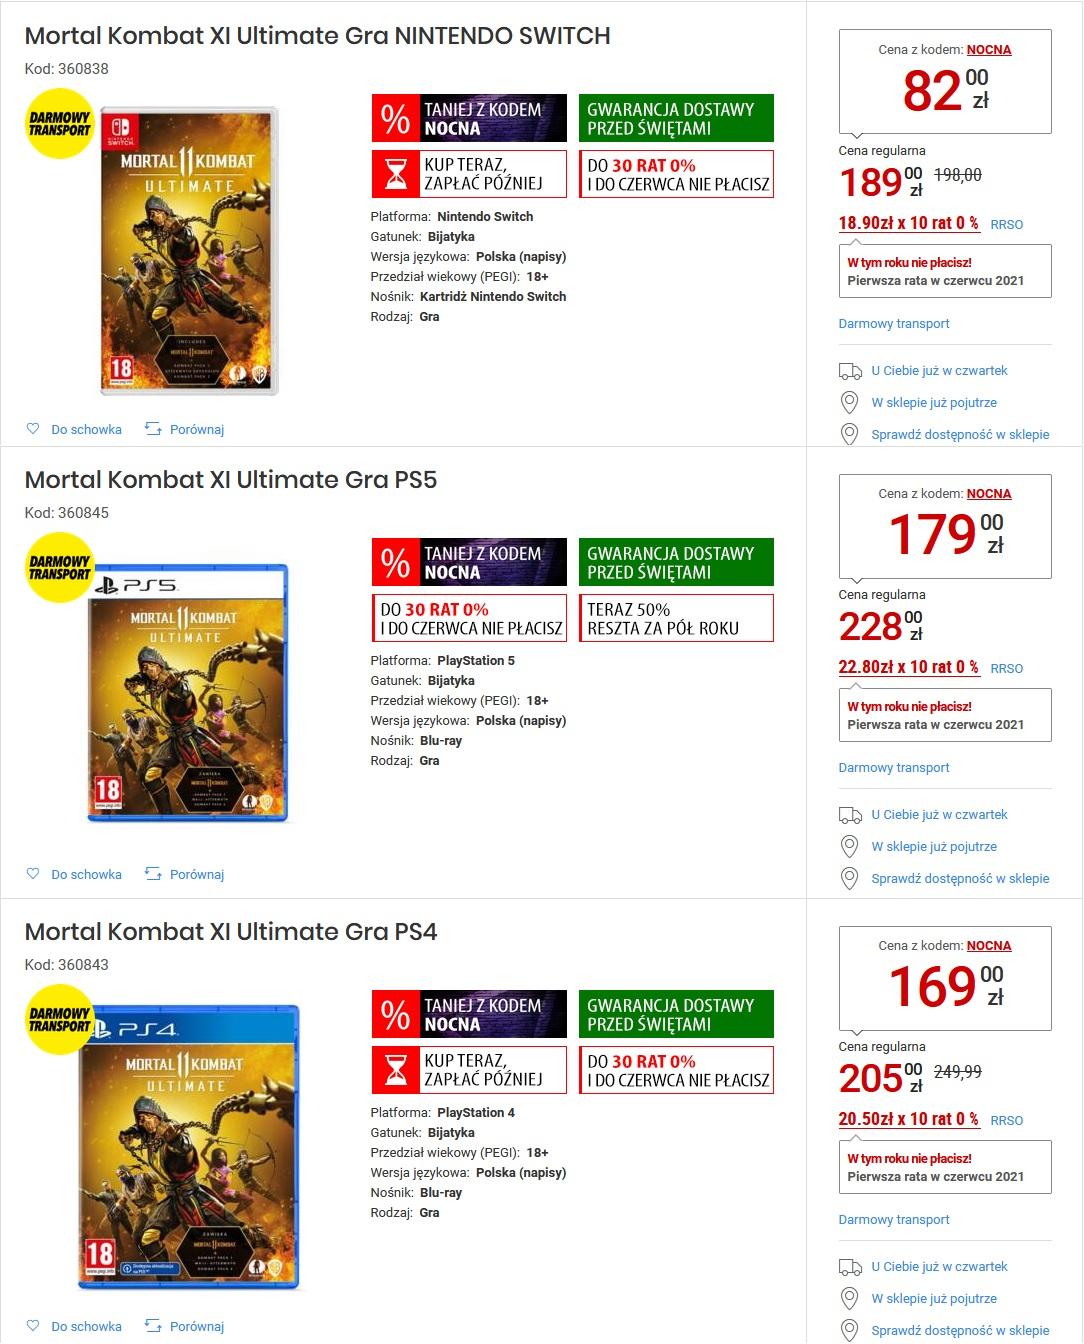 Mortal Kombat 11 Ultimate na Nintendo Switch (i na PS5/PS4) do godz. 11 @ Media Expert